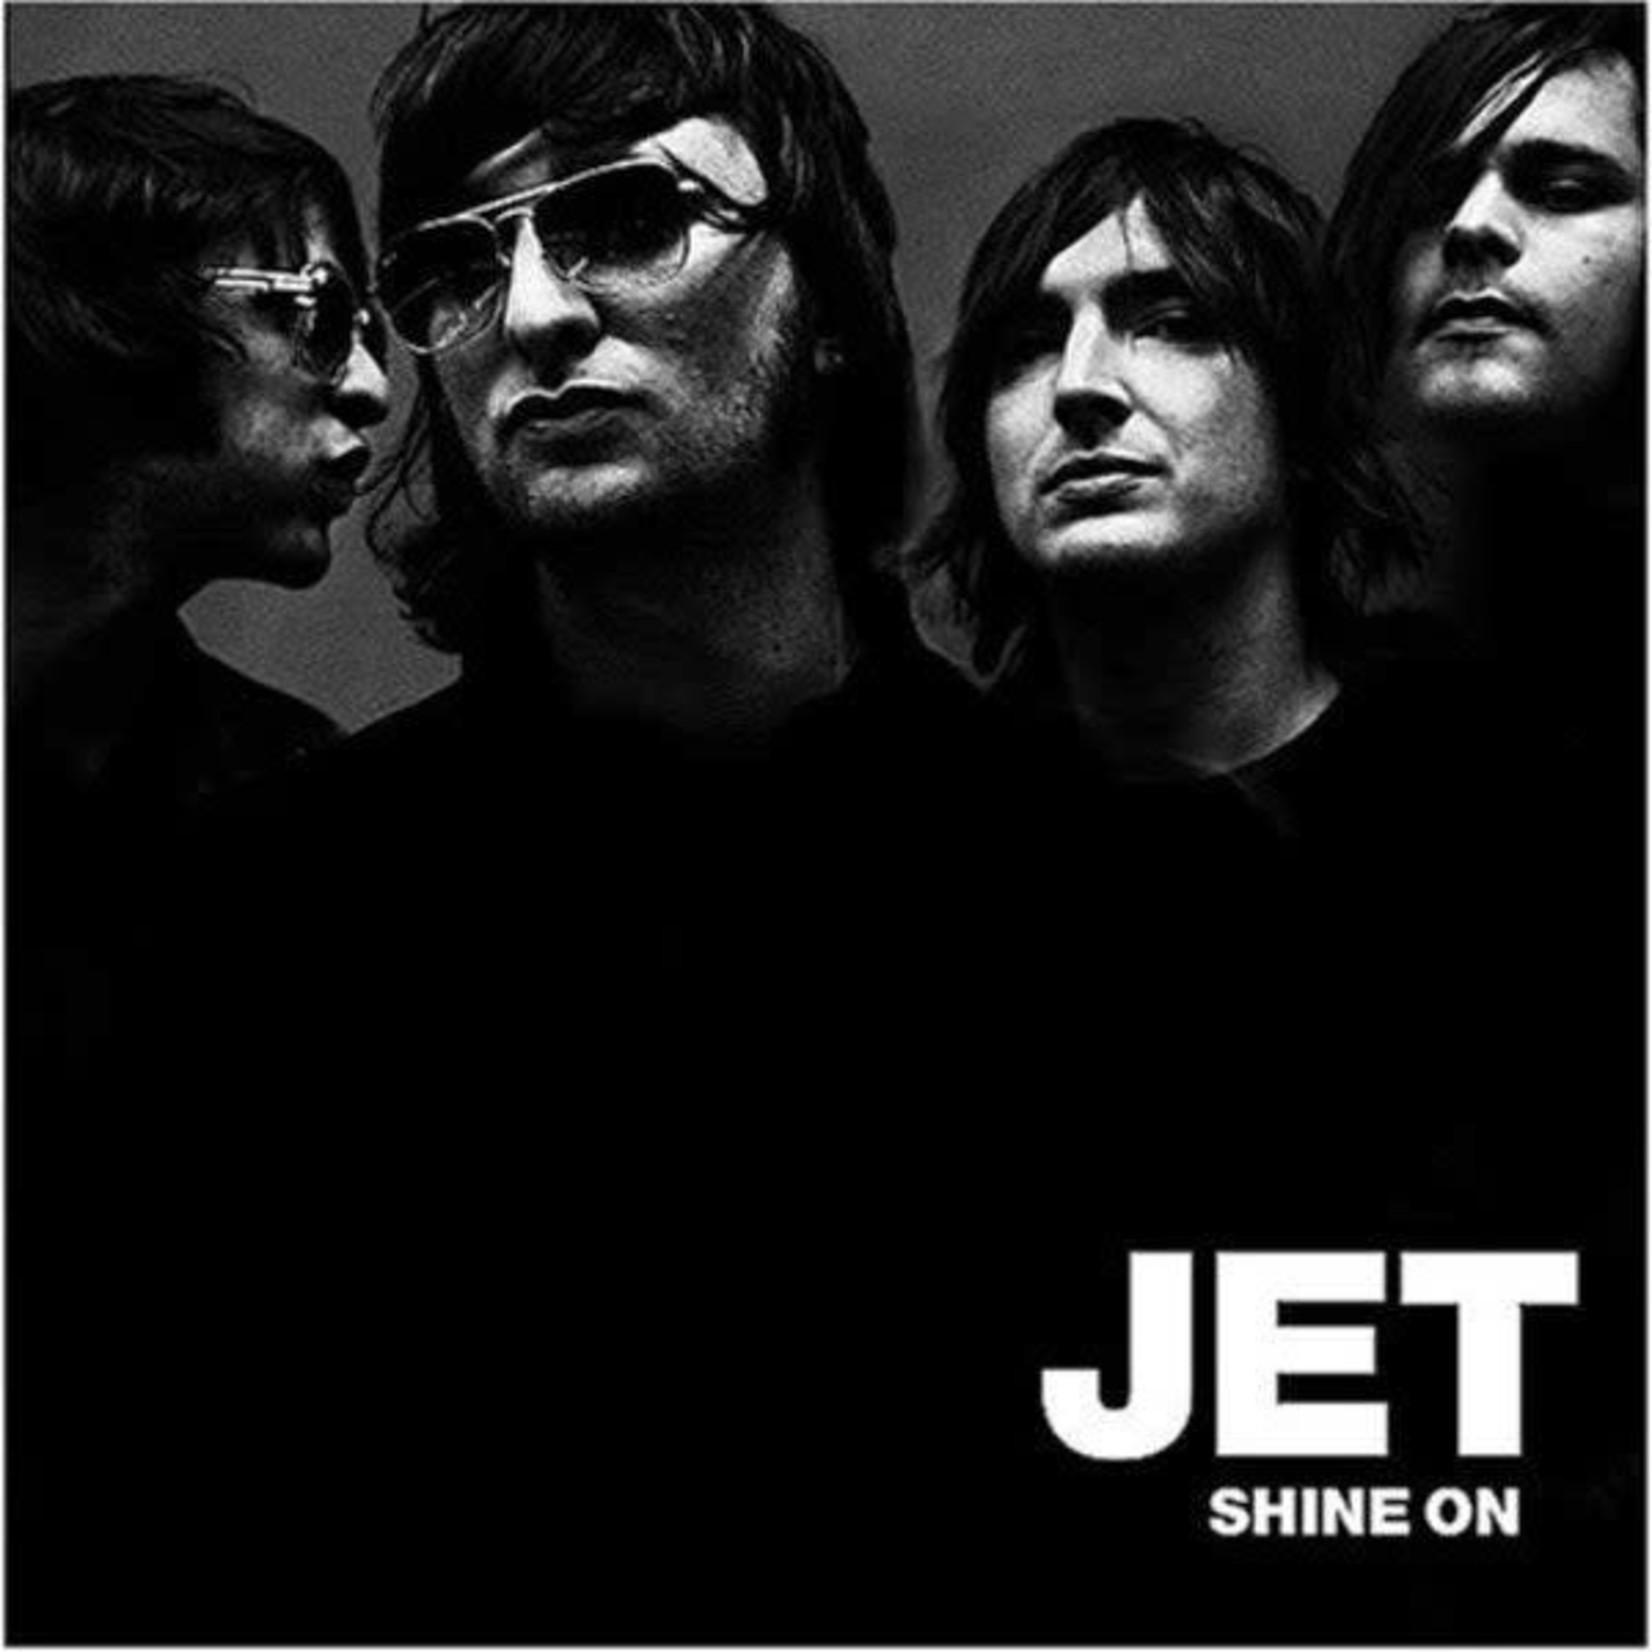 Vinyl Jet - Shine On